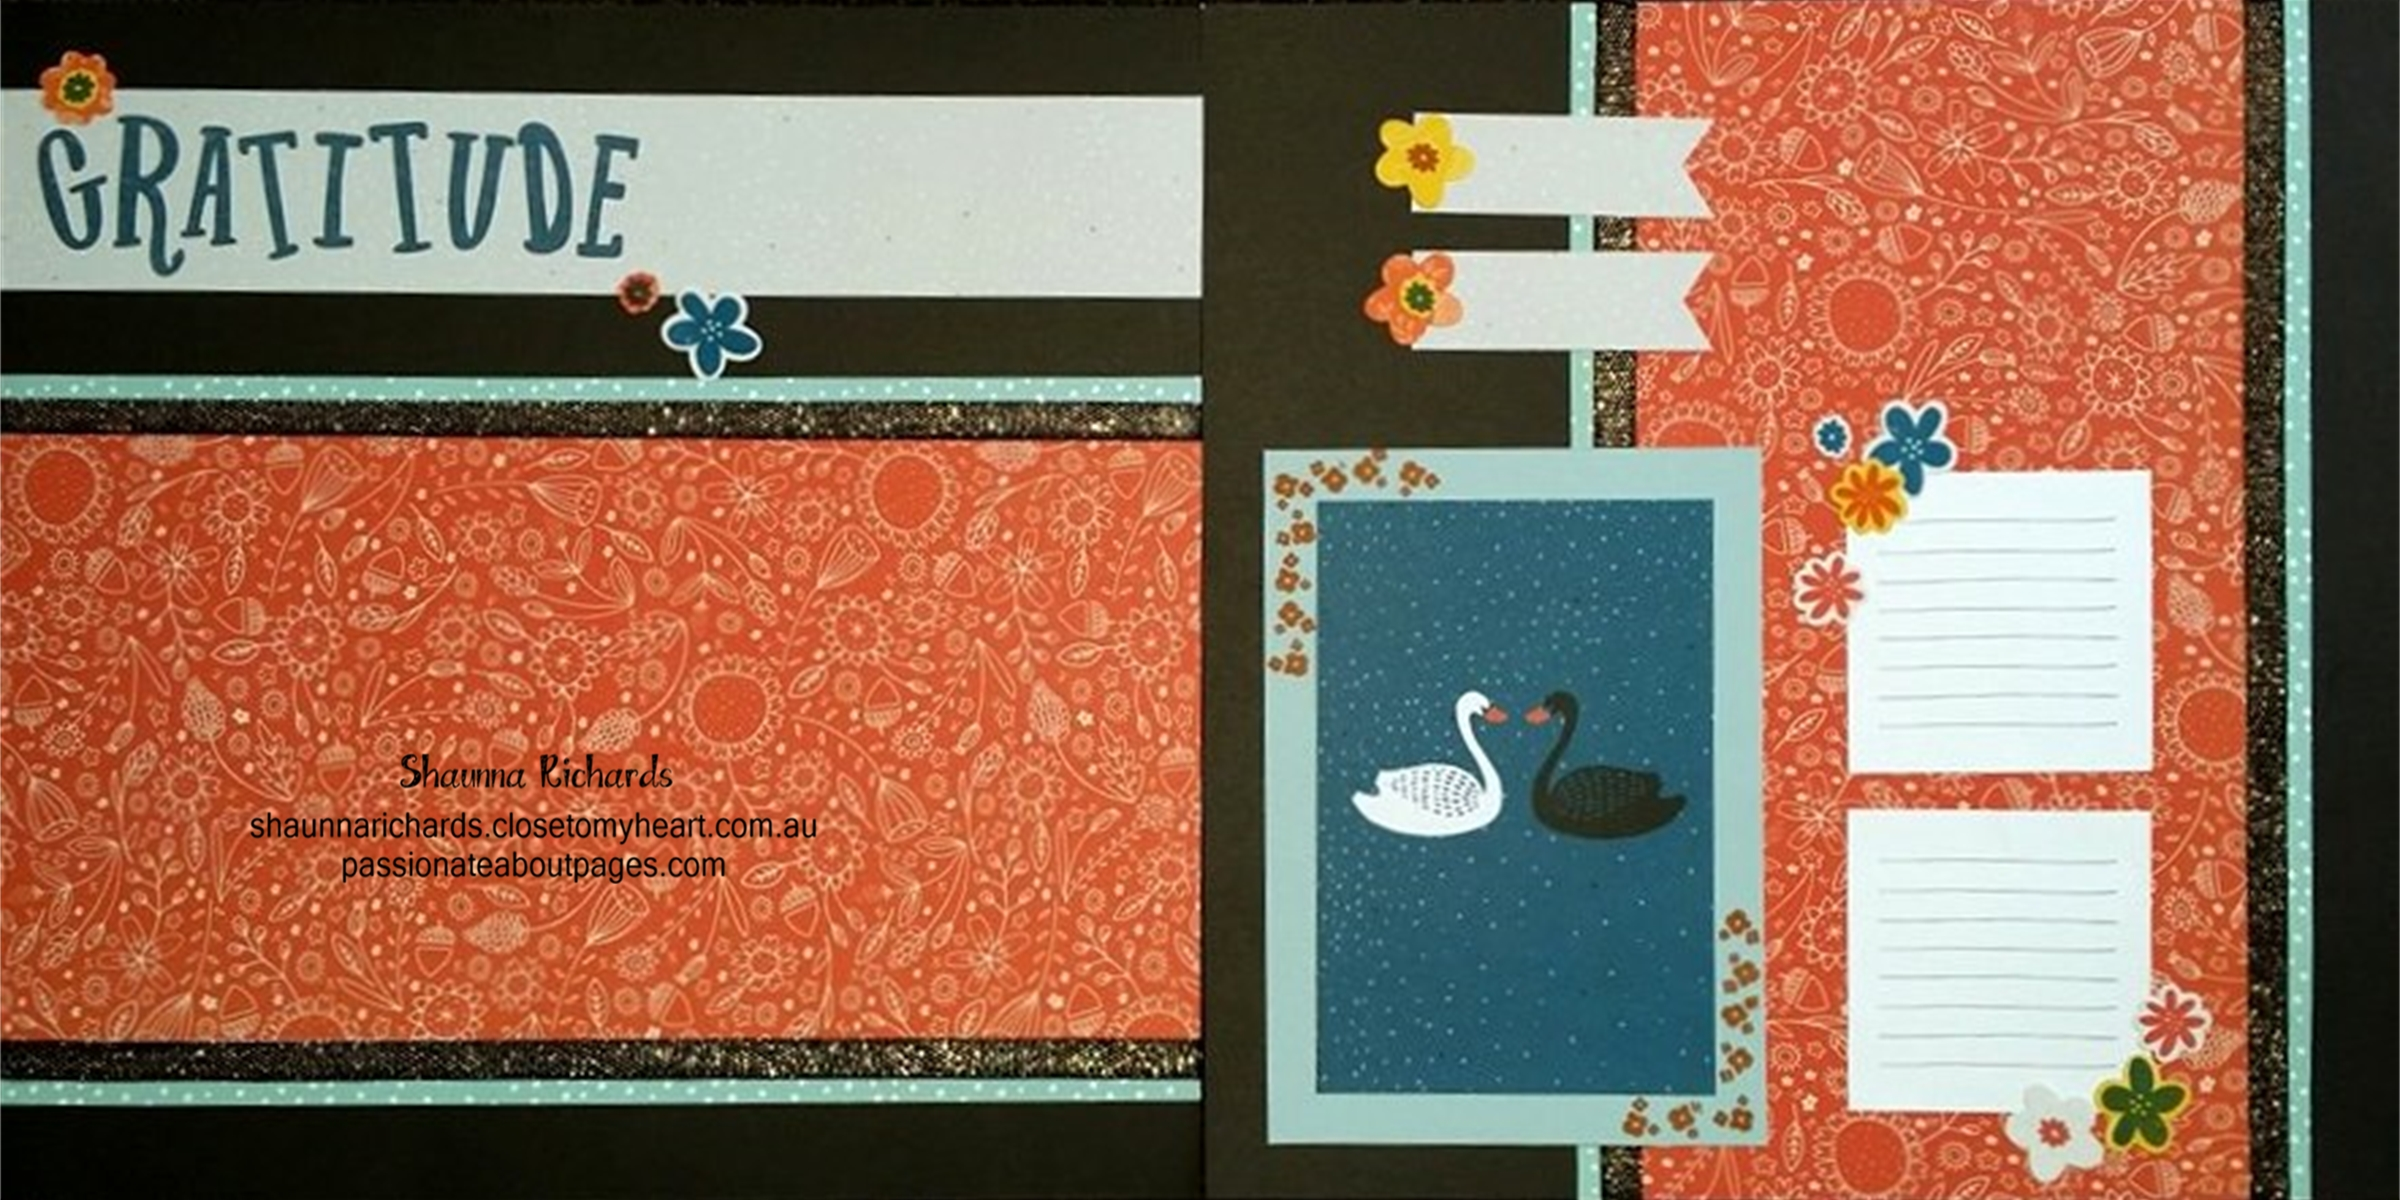 swan-lake-layouts-page-002